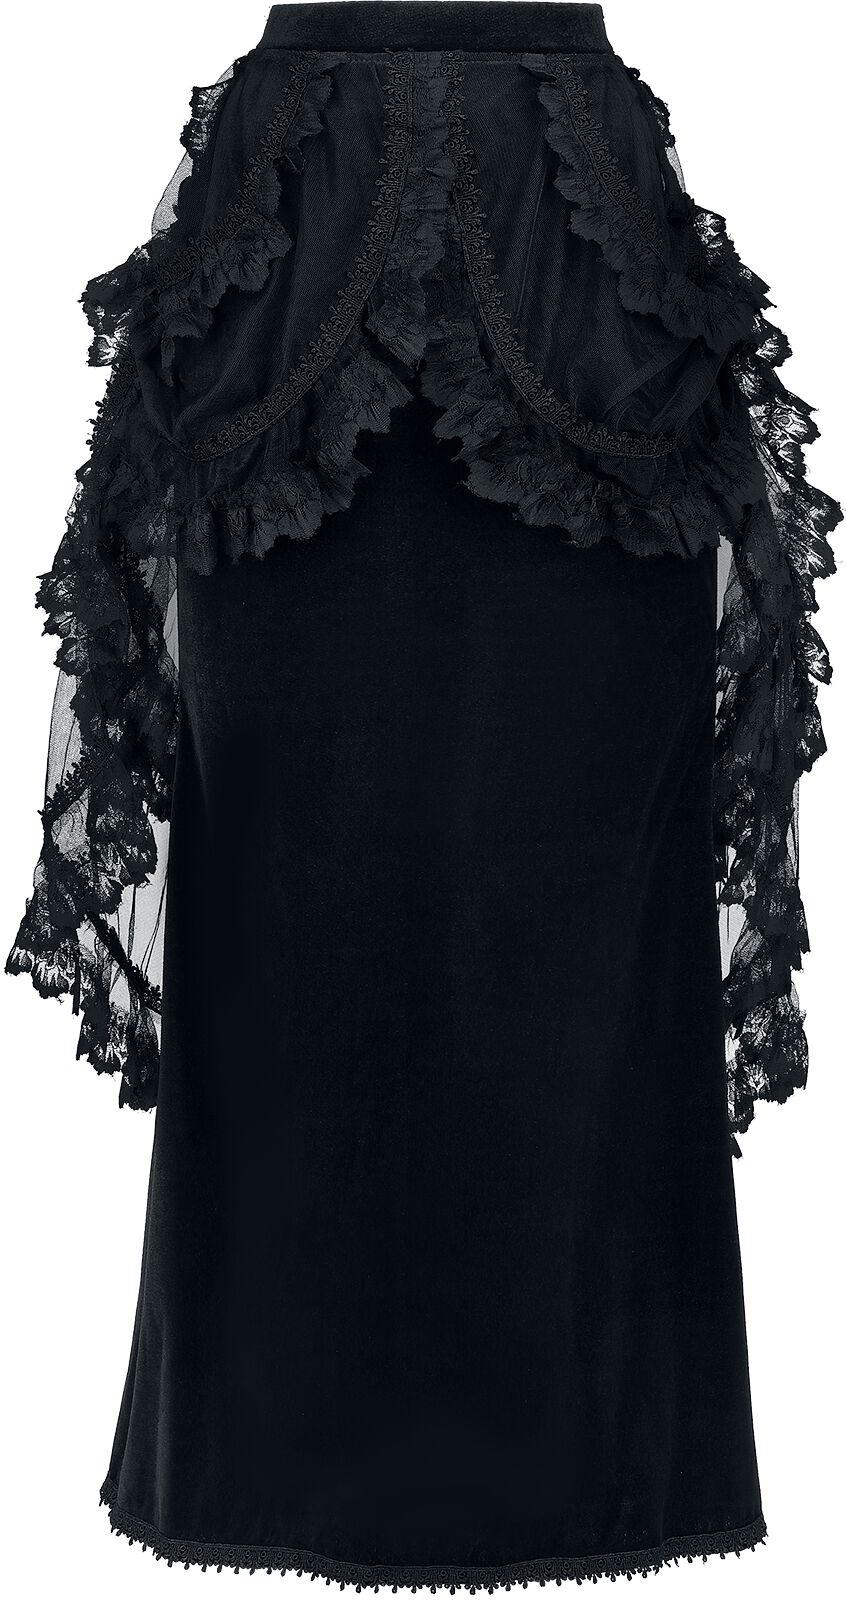 Sinister Gothic Gothic Skirt Langer Rock schwarz 972 BLACK